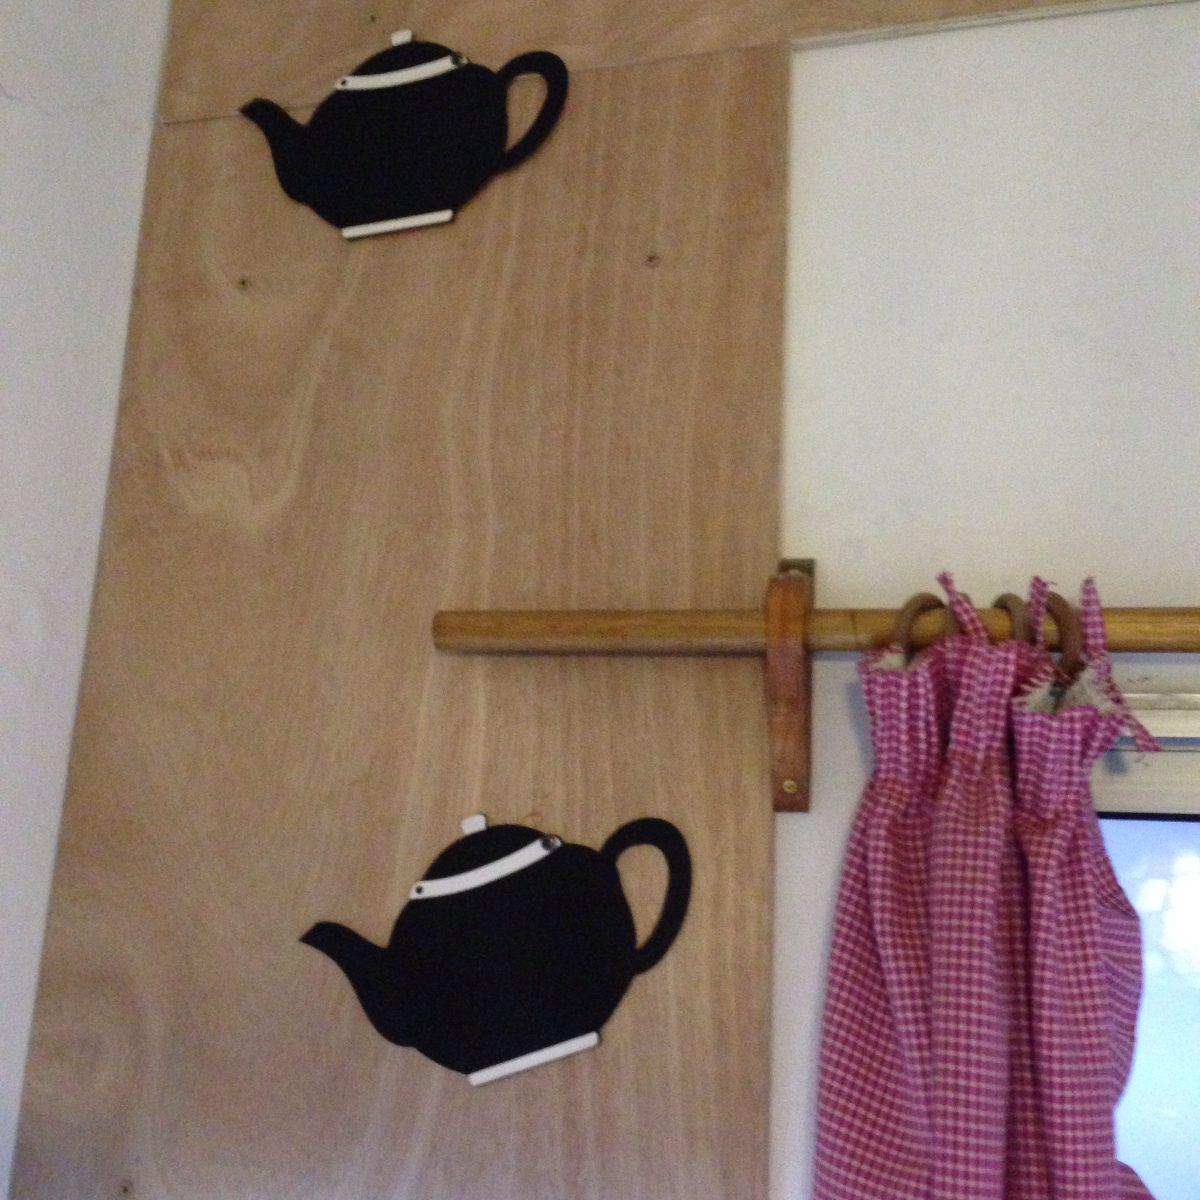 Pizarra adorno en madera para cocina 180 00 en - Escaleras de madera adorno ...